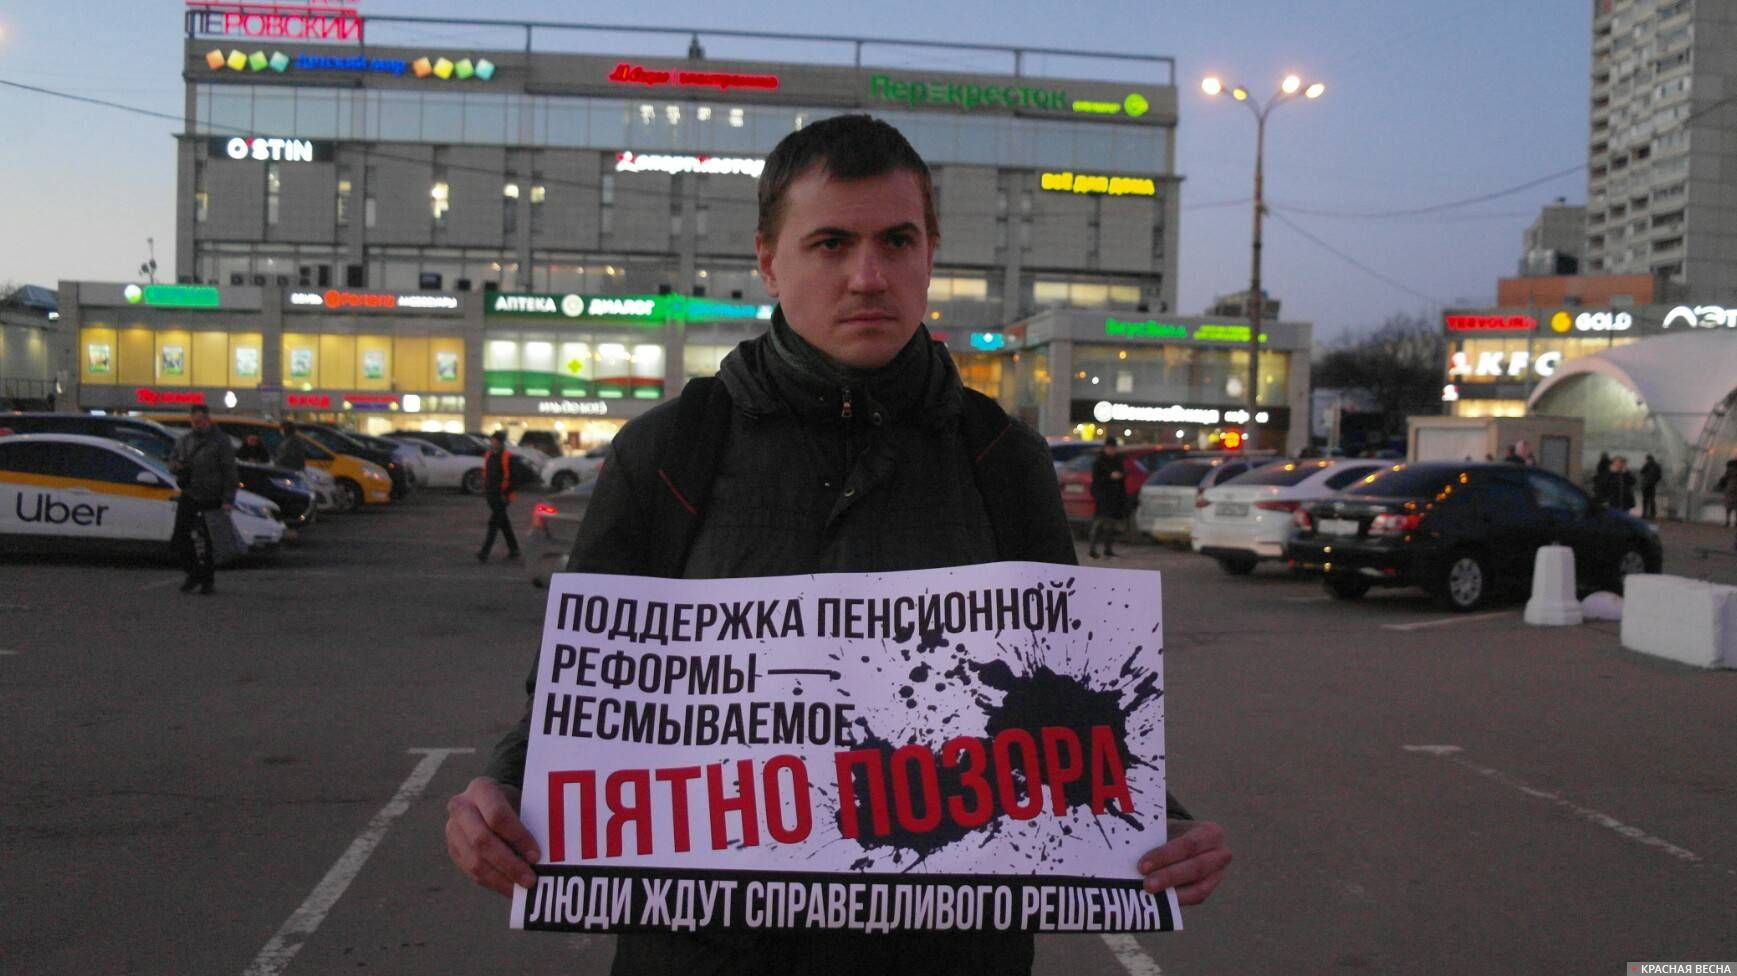 Пикет возле м.Новогиреево, Москва